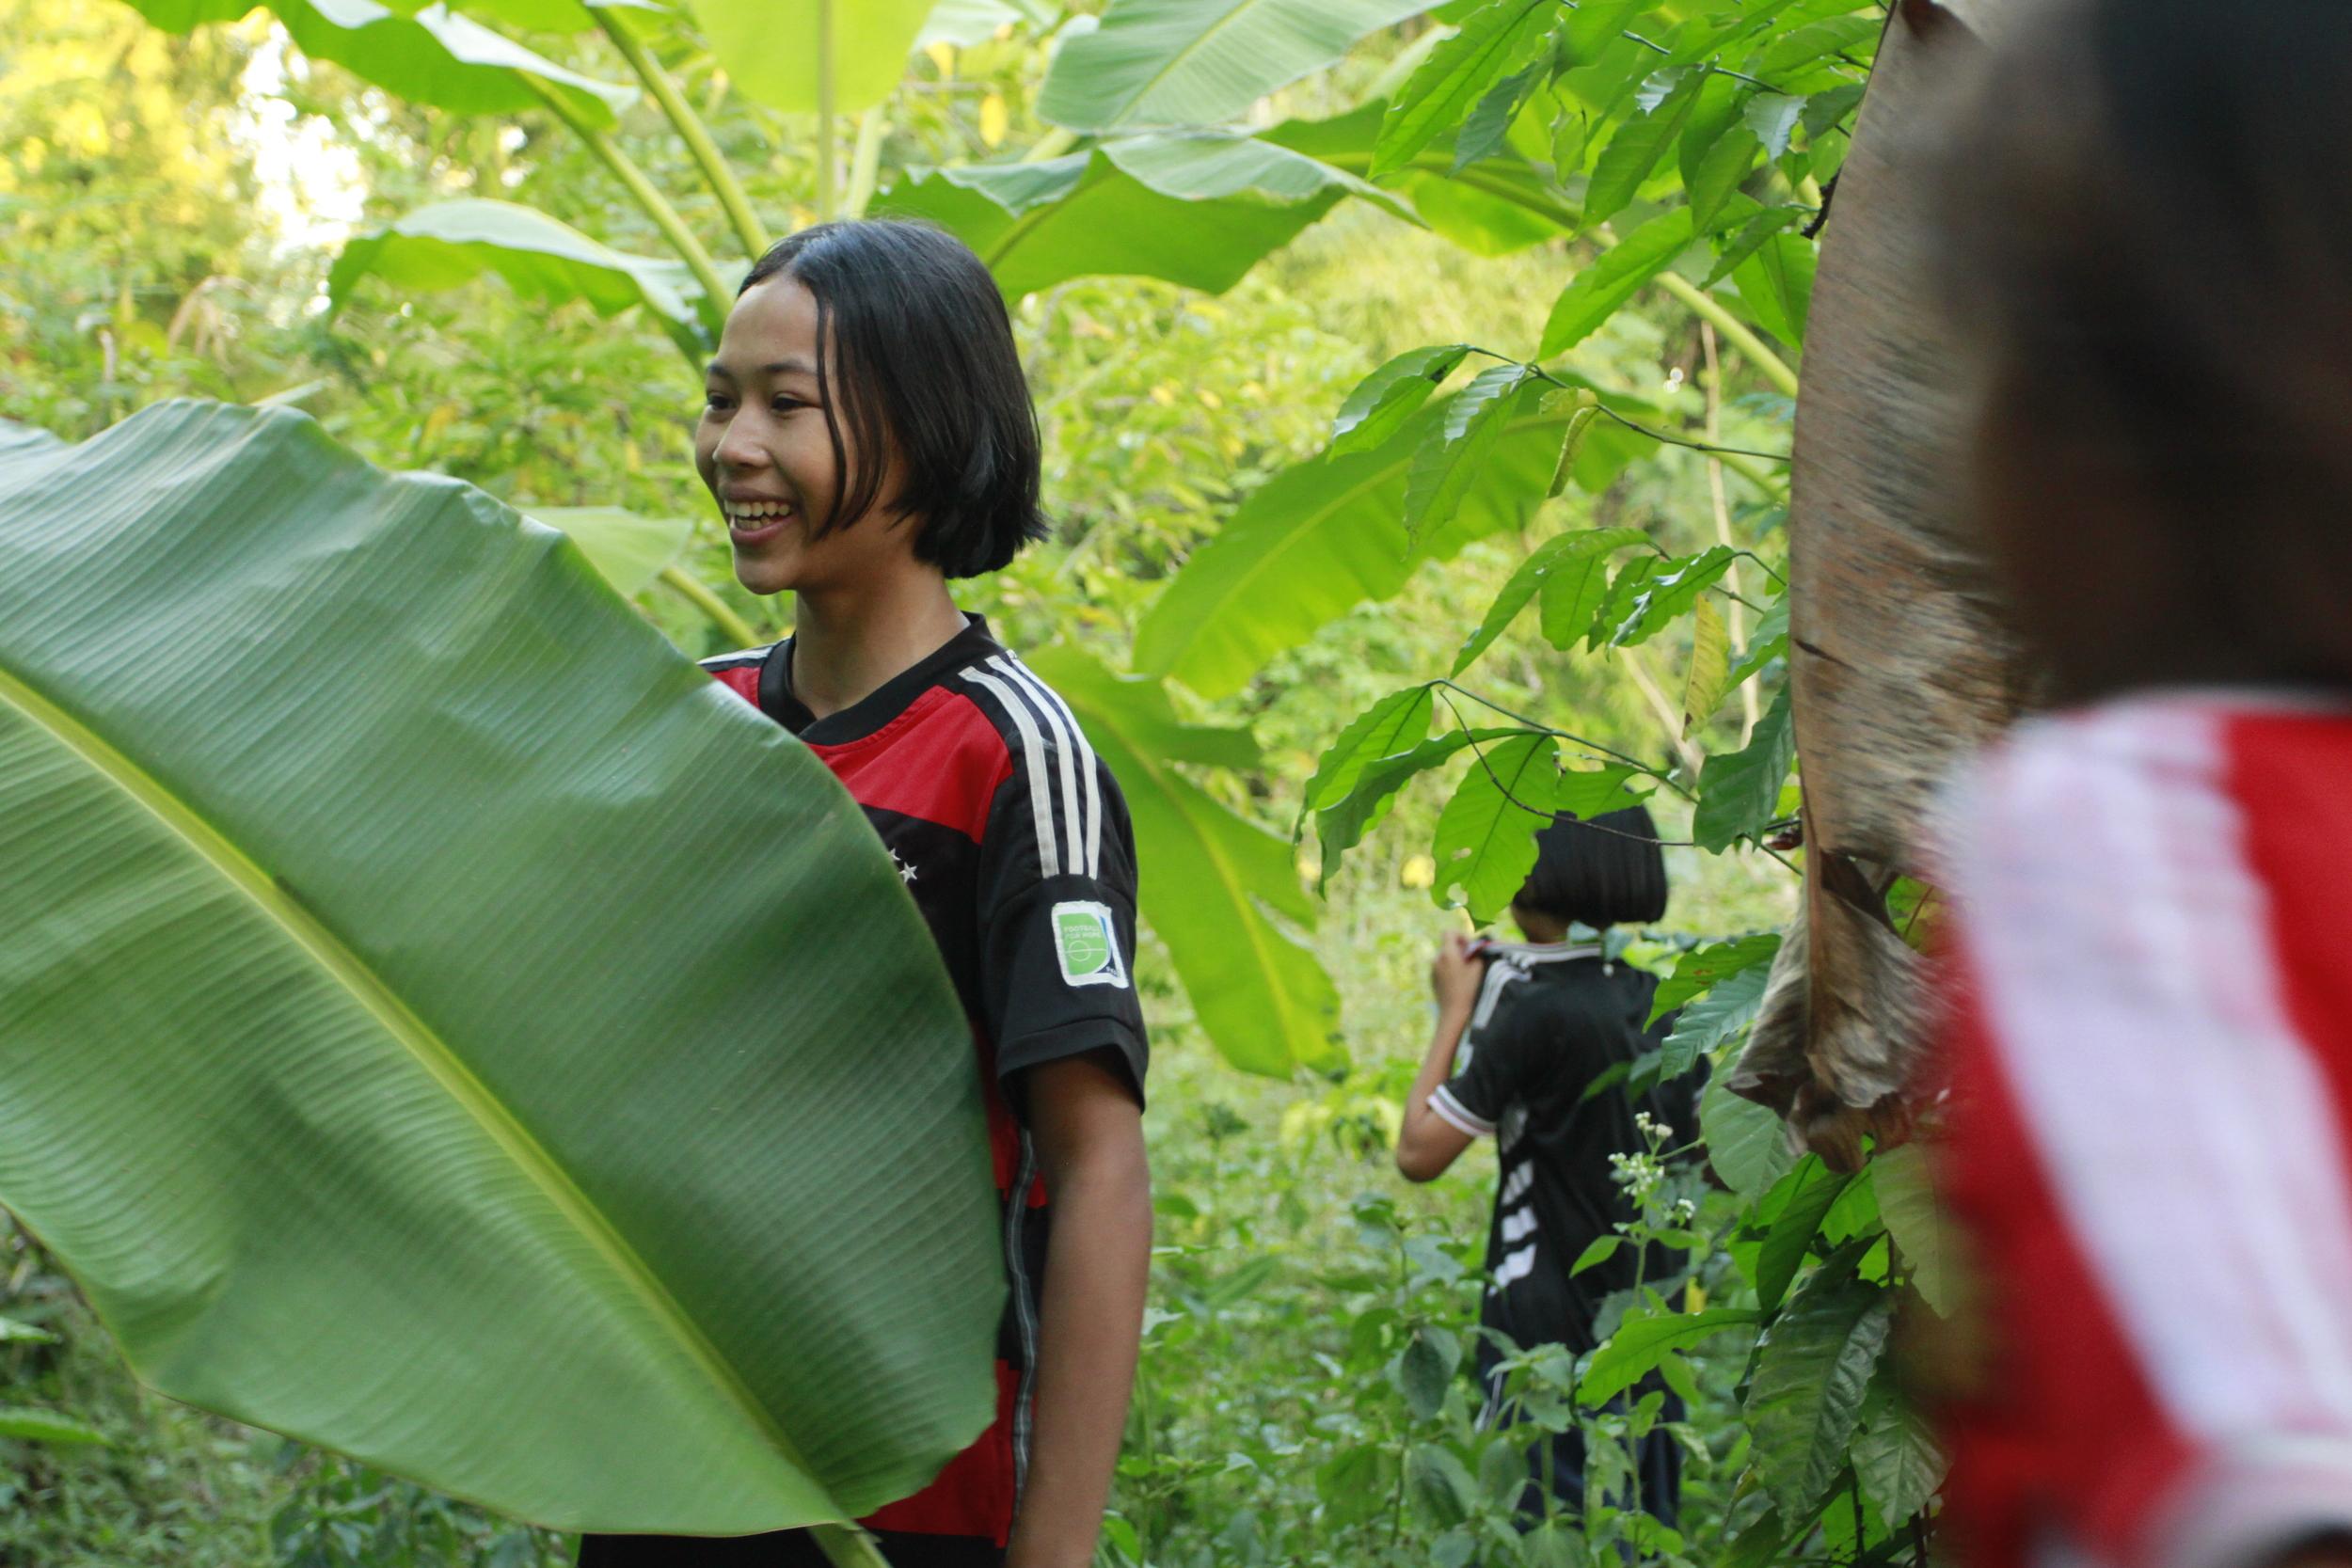 Min collecting banana tree leaves to make the krathong